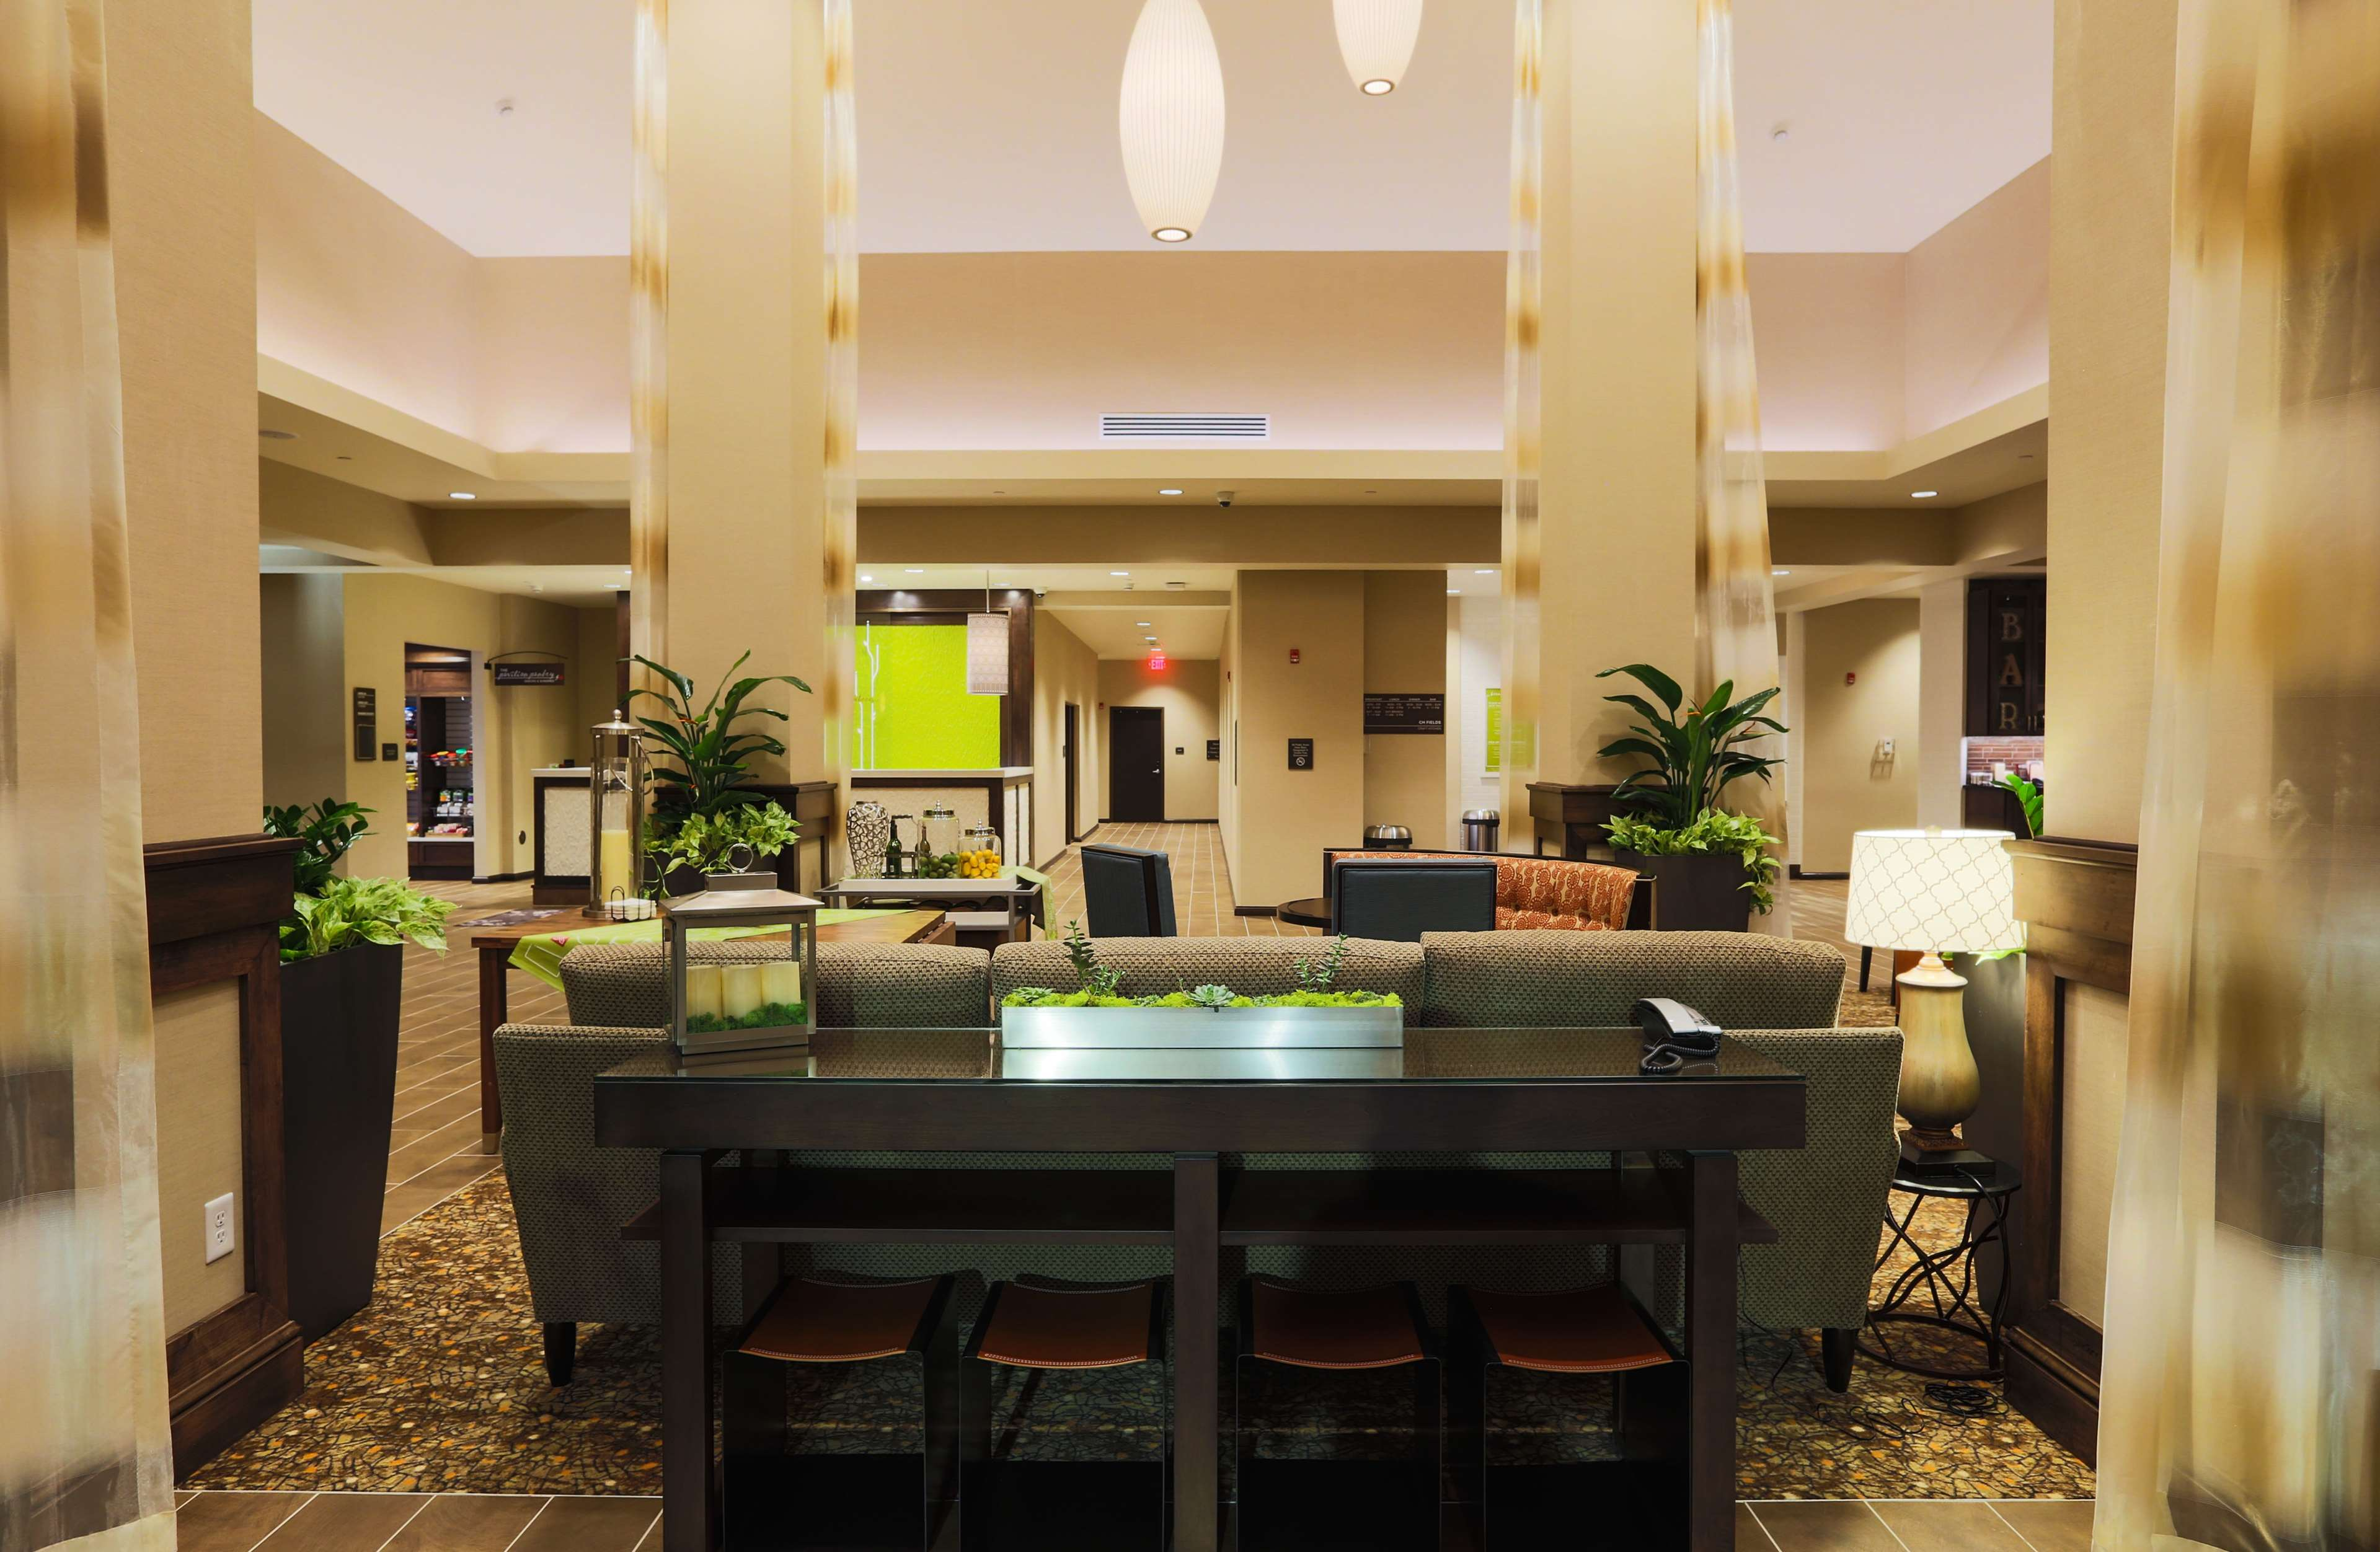 Hilton Garden Inn Indiana at IUP image 3